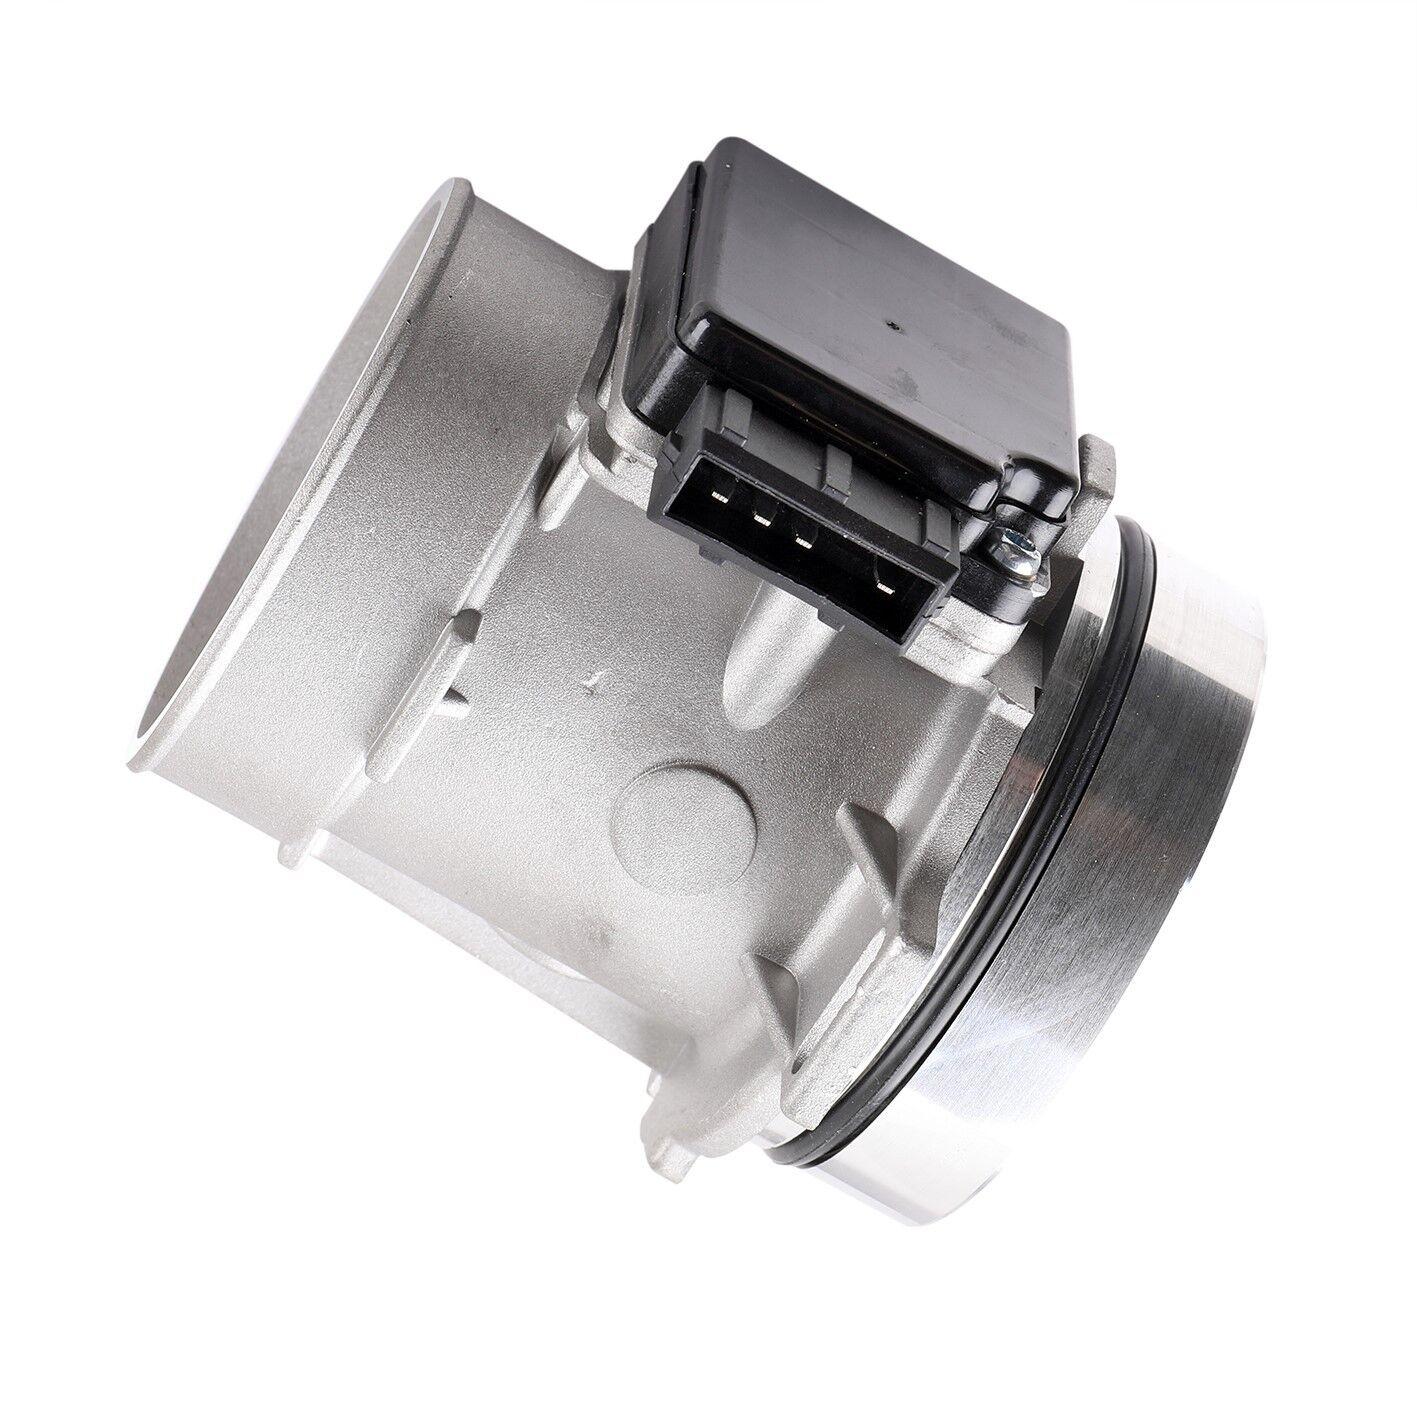 Delphi AF10120 Mass Air Flow Sensor Meter for Ford Mercury Lincoln New